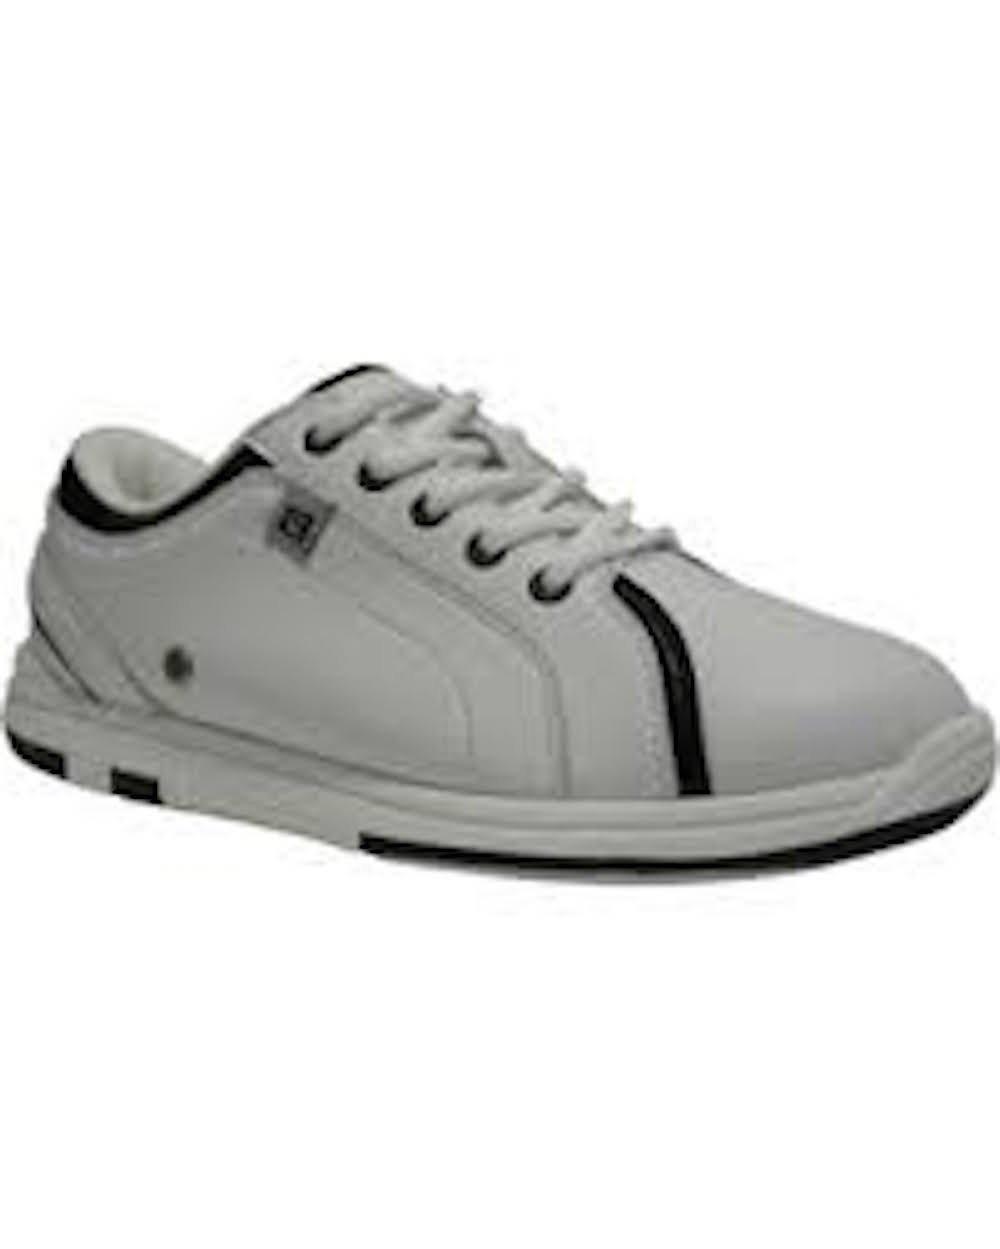 Brunswick Women's Rave White/Black Bowling Shoes Size 8.5 by Brunswick (Image #1)